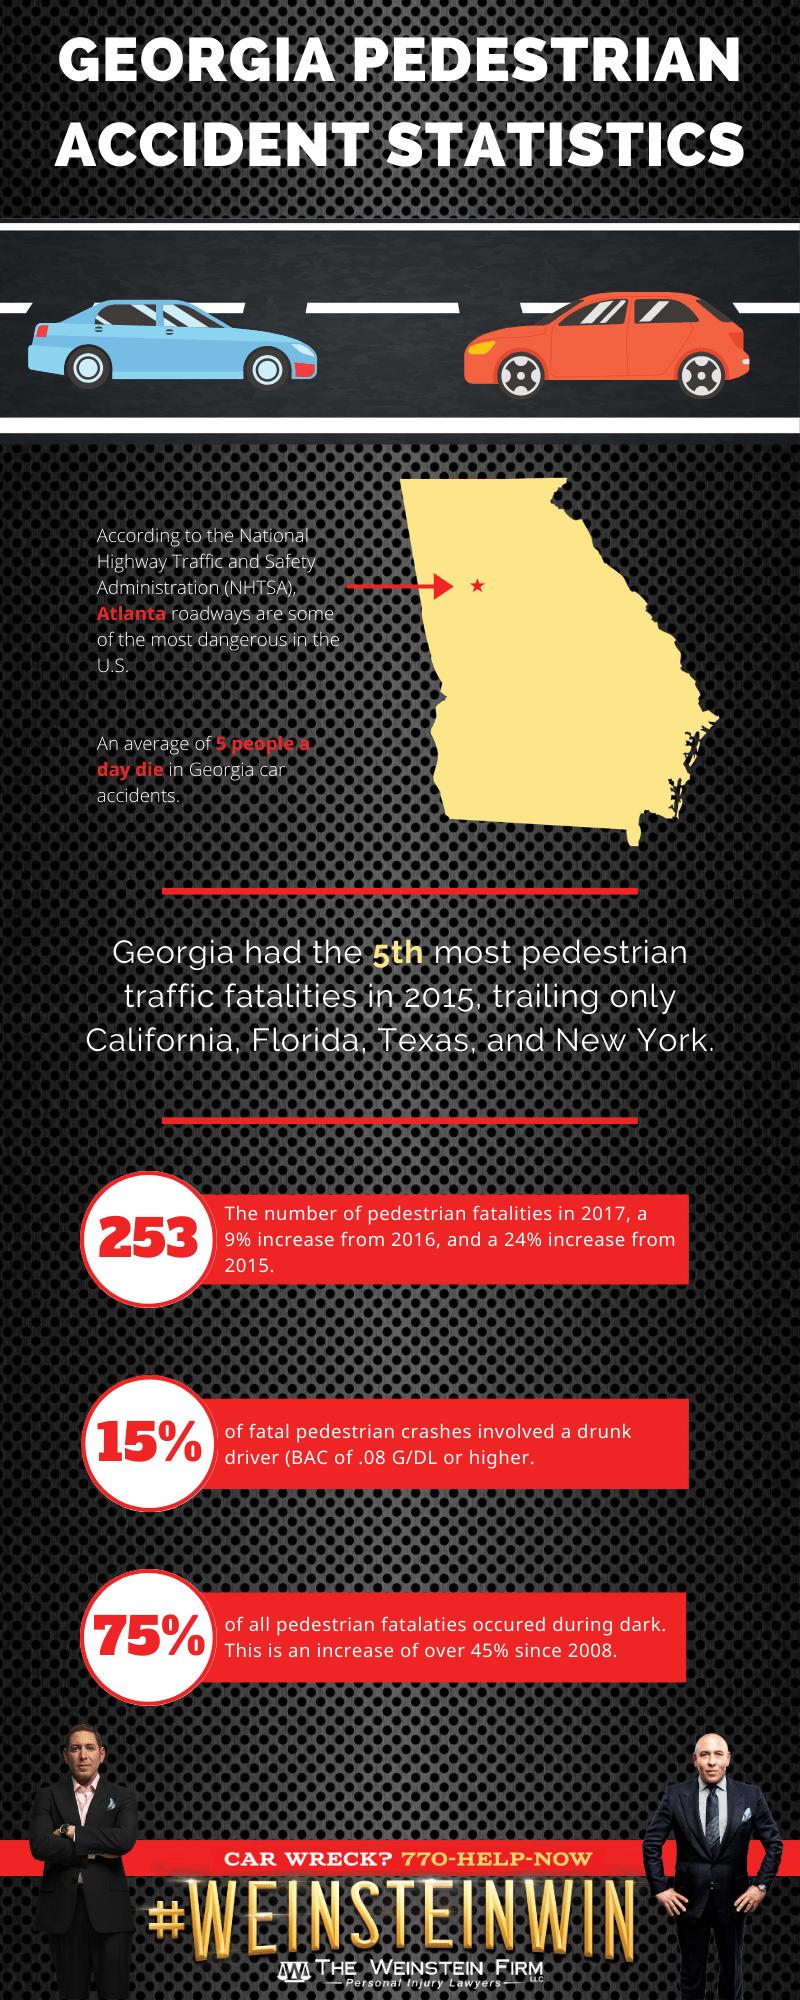 Atlanta Pedestrian Accidents Infographic